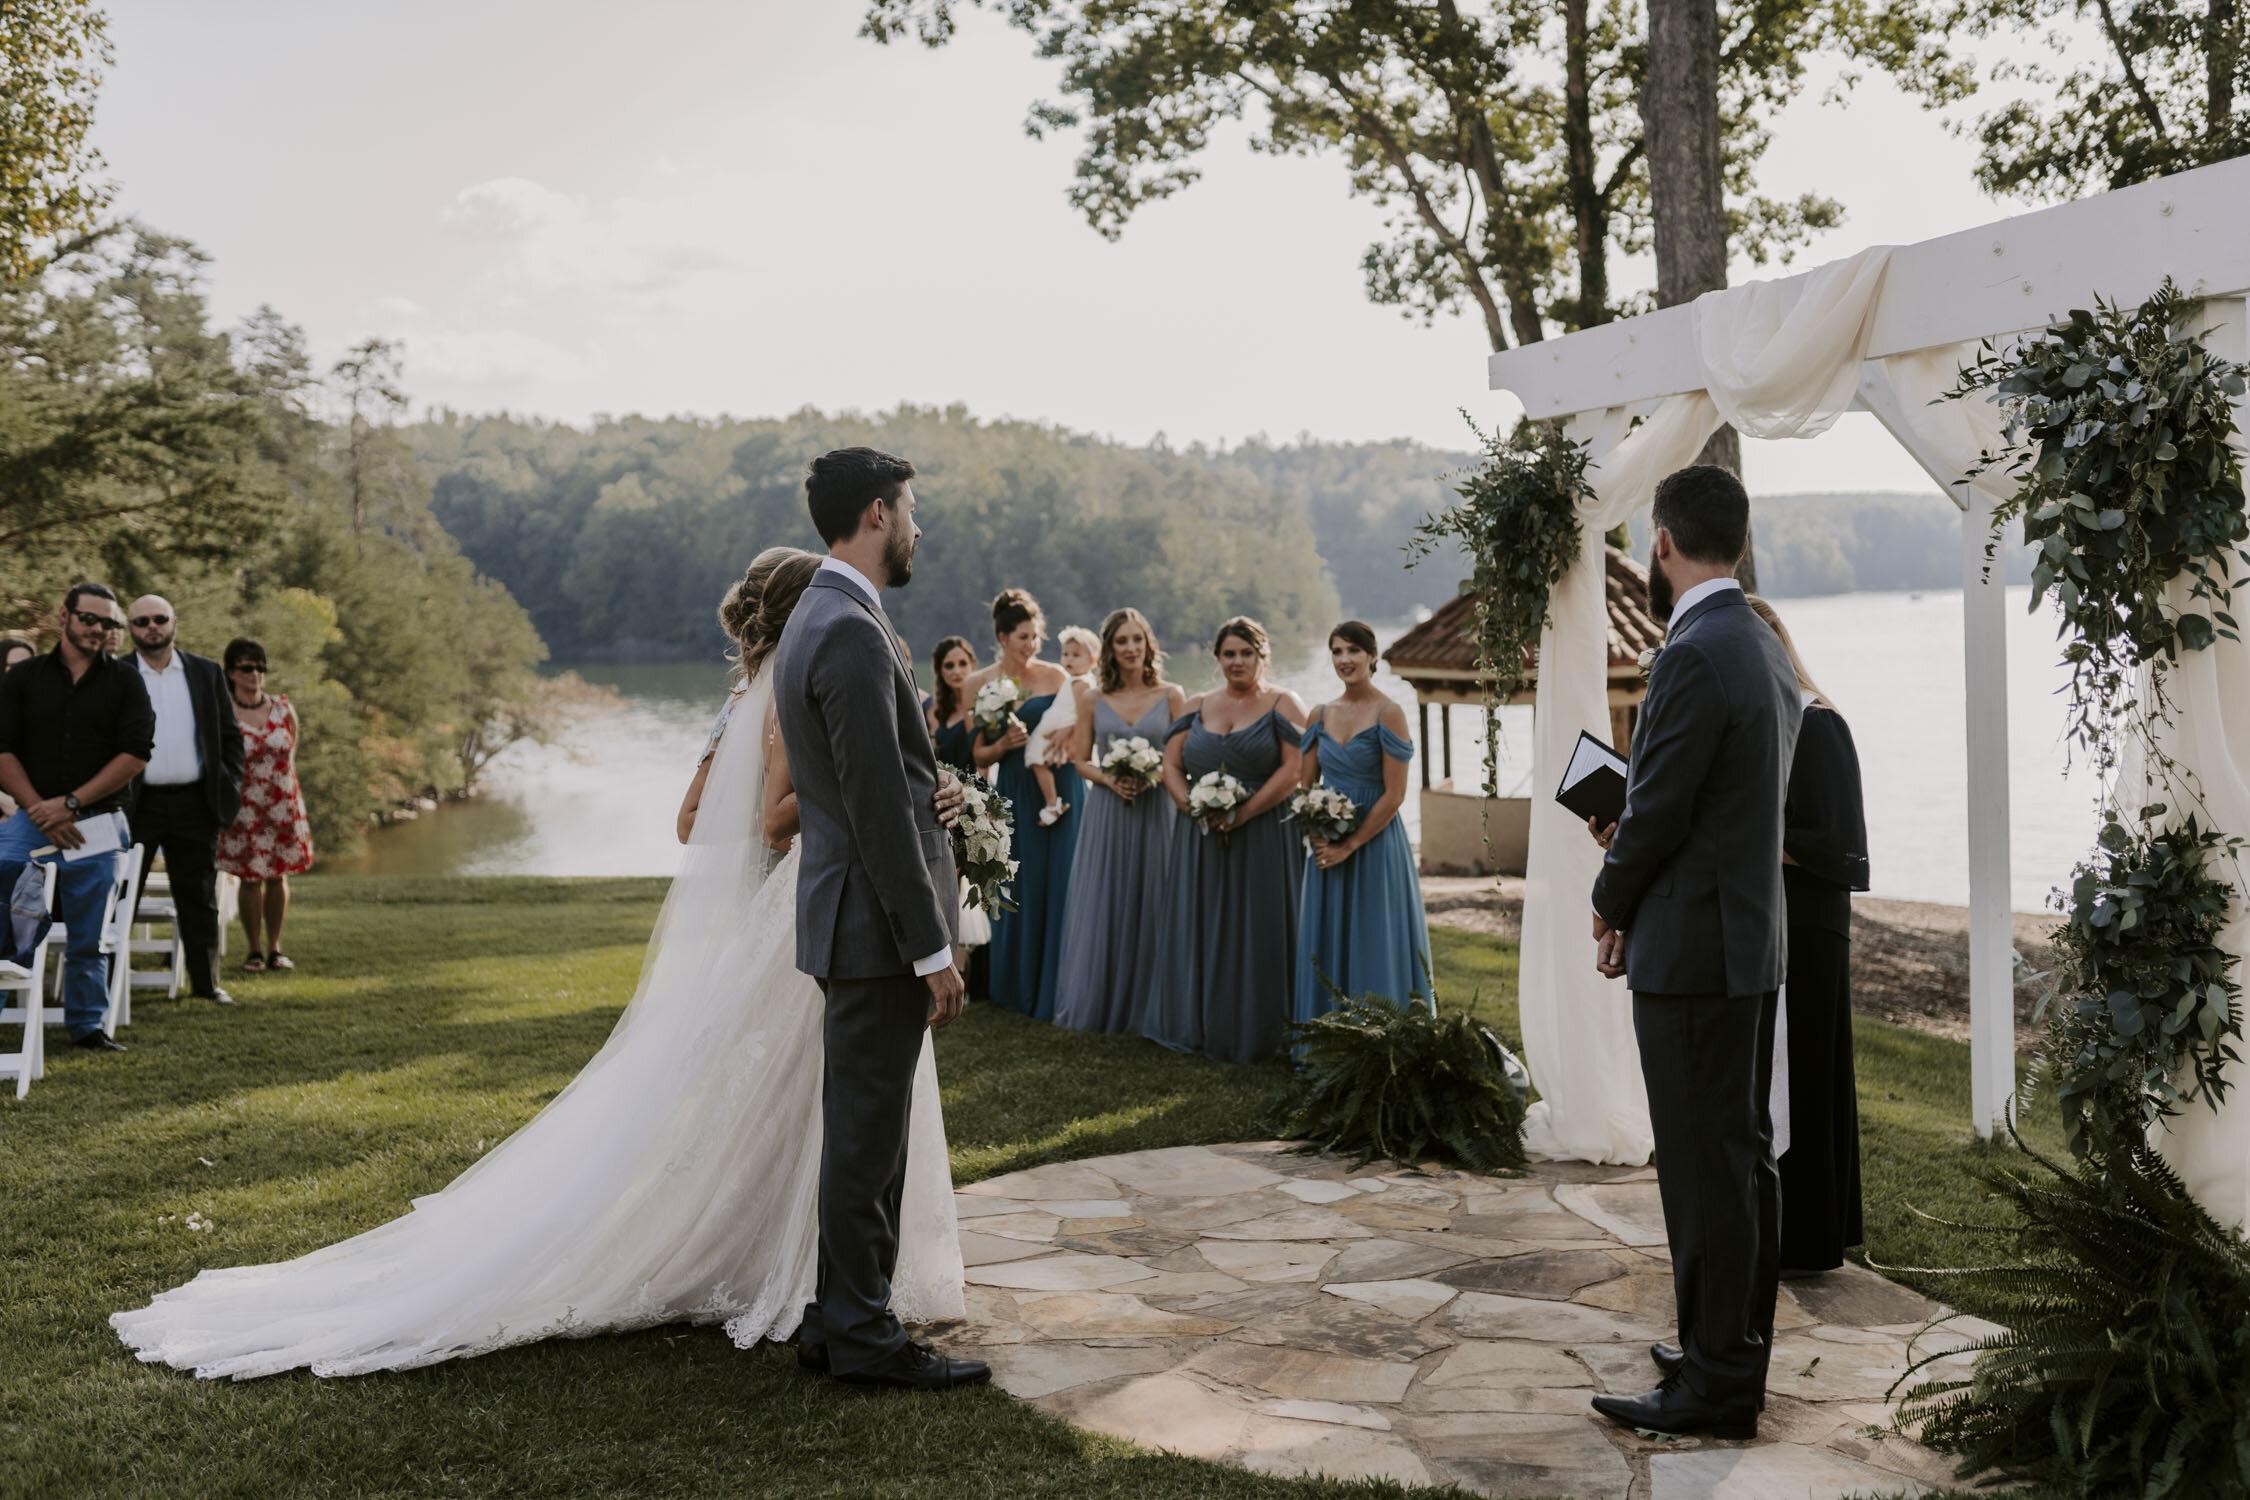 Romantic Wedding Ceremony at Bella Collina   By Greensboro, NC Wedding Photographer: Kayli LaFon Photography